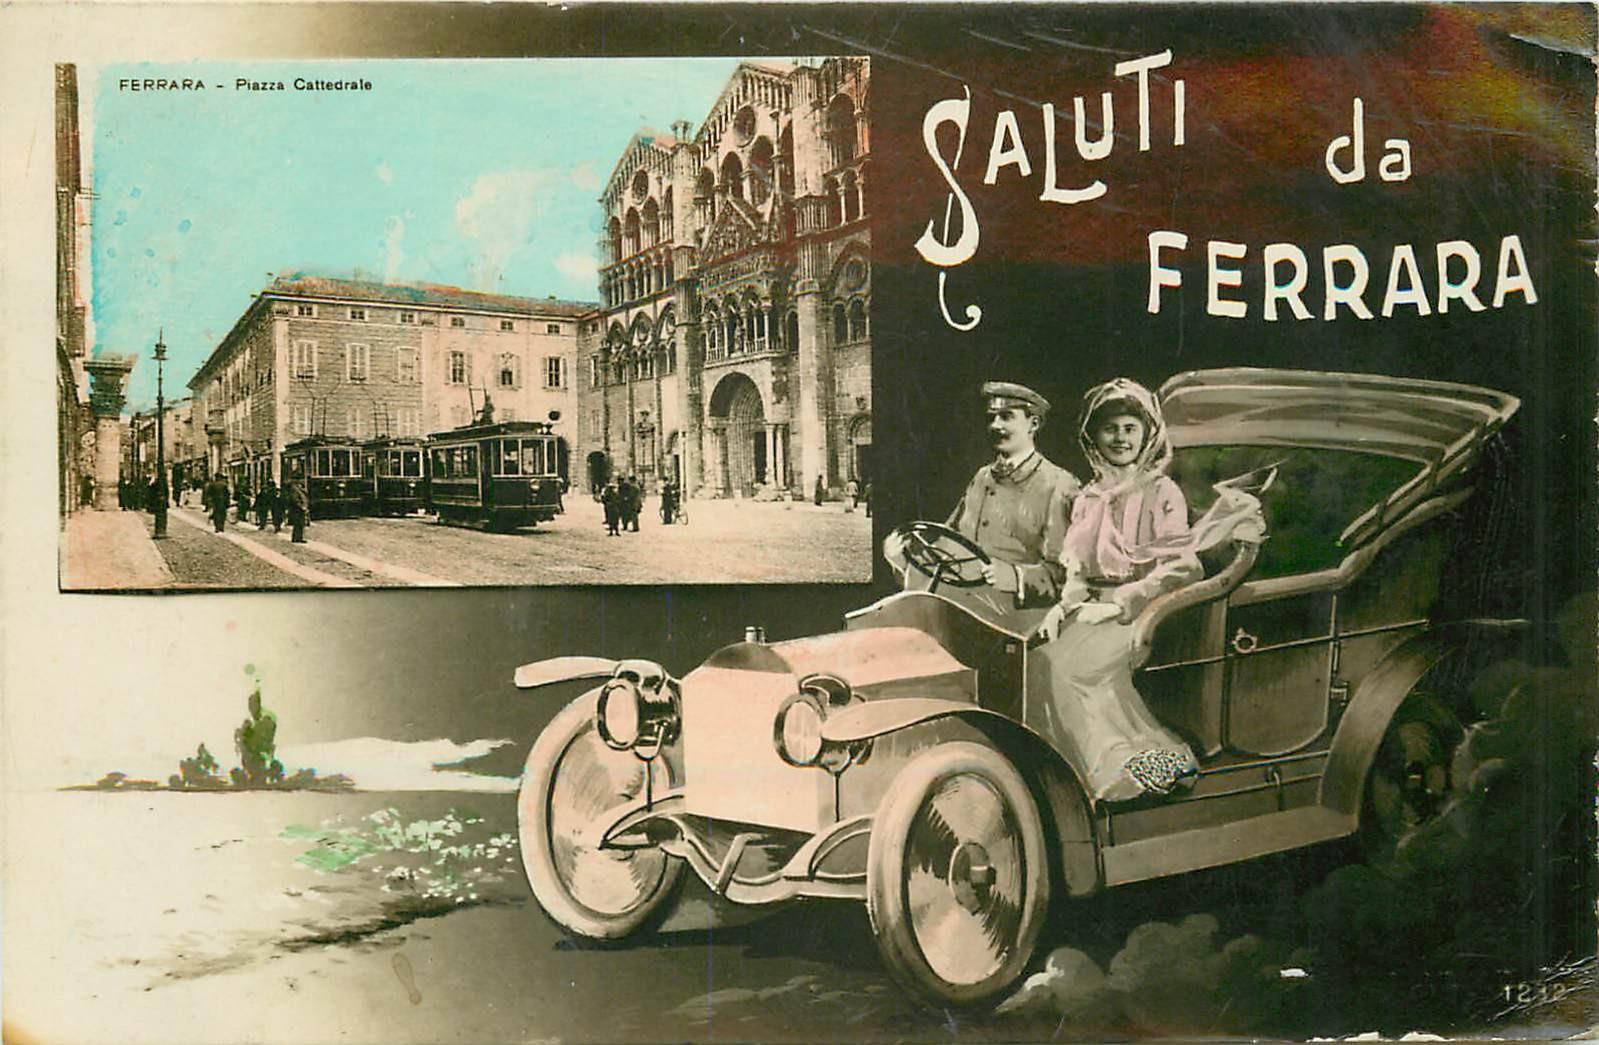 FERRARA. Saluti en voiture ancienne avec chauffeur de la Piazza Cattedrale con tram 1912